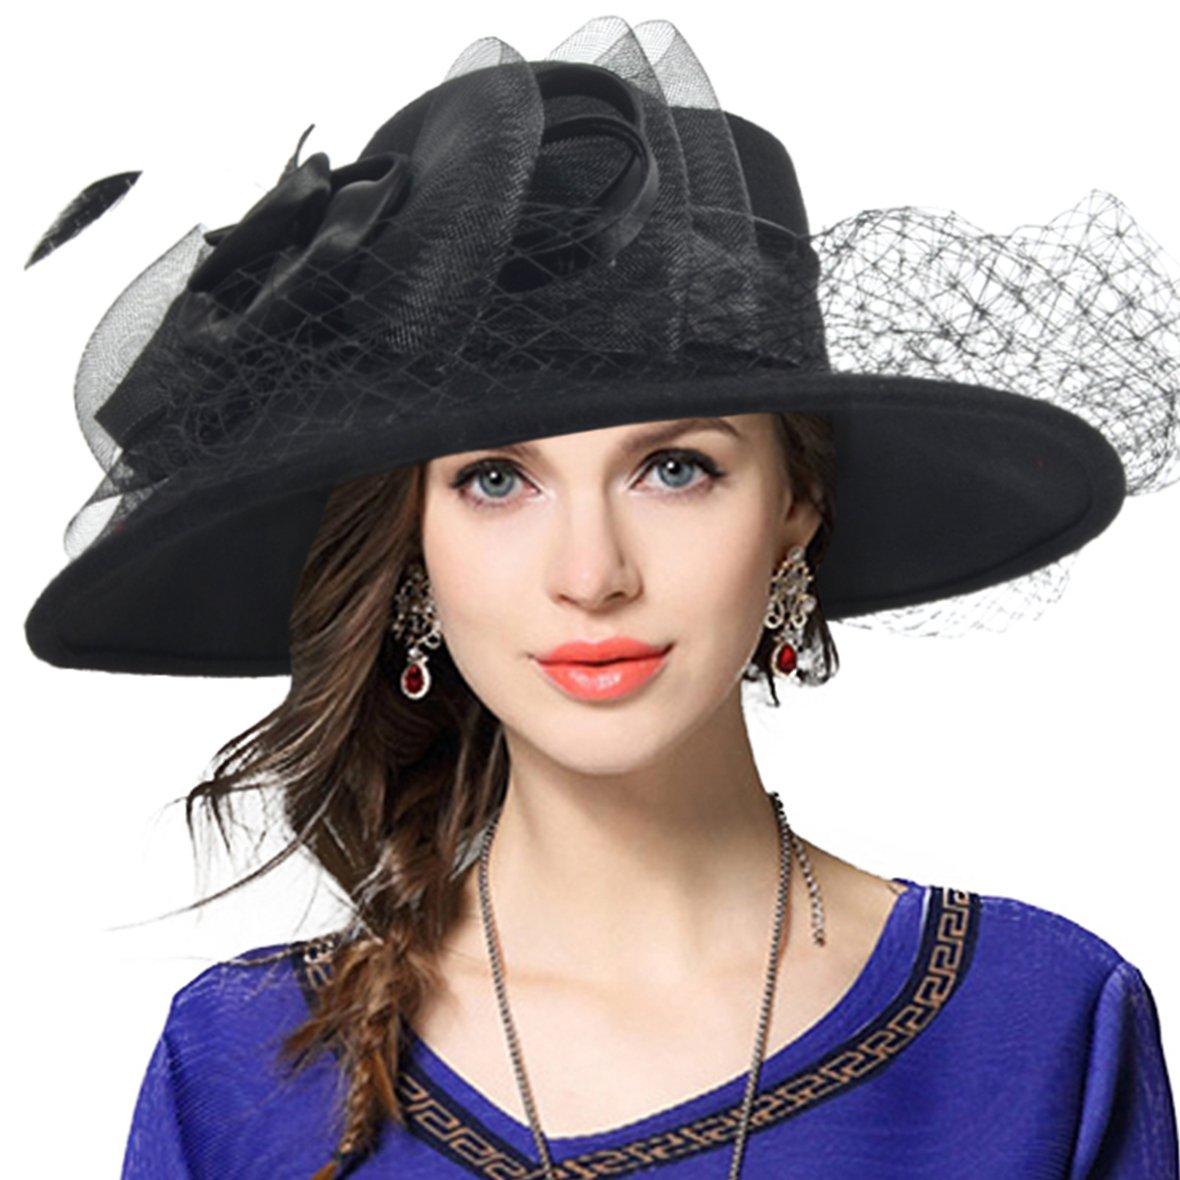 VECRY Women's Fascinator Wool Felt Hat Cocktail Party Wedding Fedora Hats (B-Black)